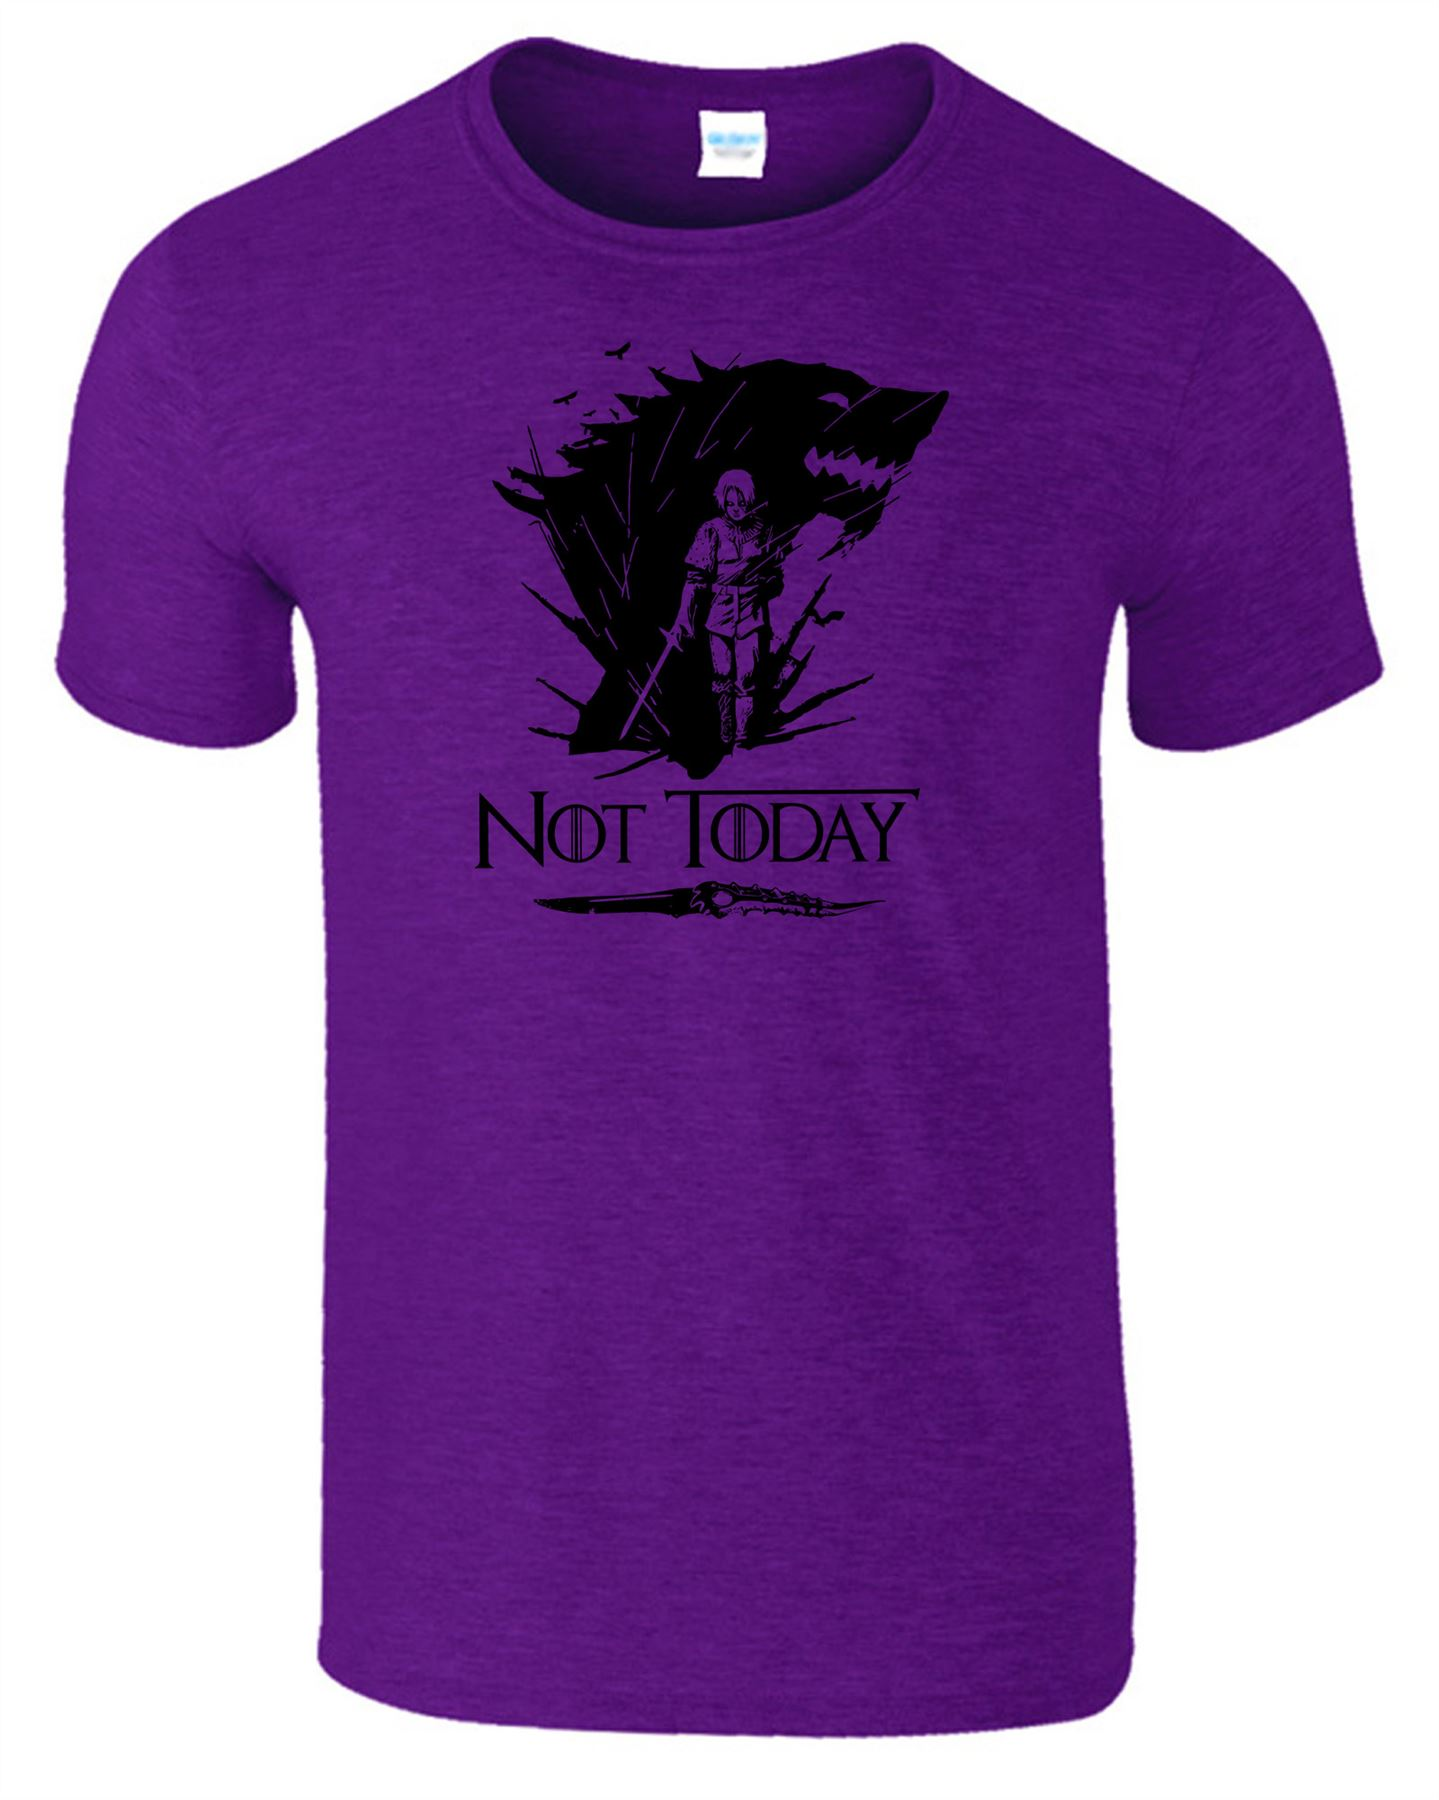 Arya-Stark-Not-Today-T-Shirt-Mens-Game-Season-Womens-Shirt-Adults-Unisex-Fit Indexbild 18